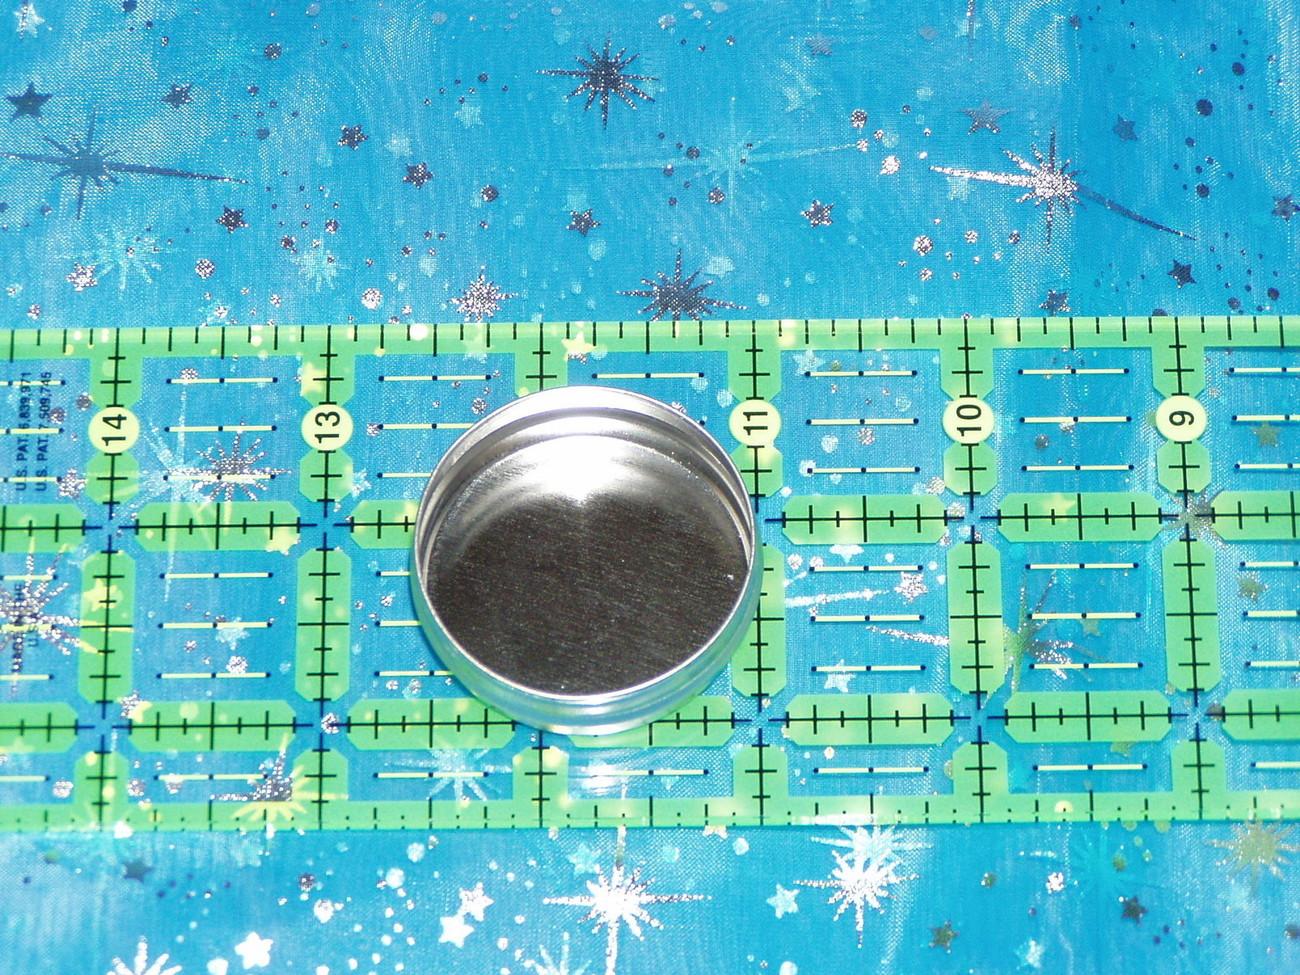 6 round pressure fit top tin storage box 1/2 oz #311